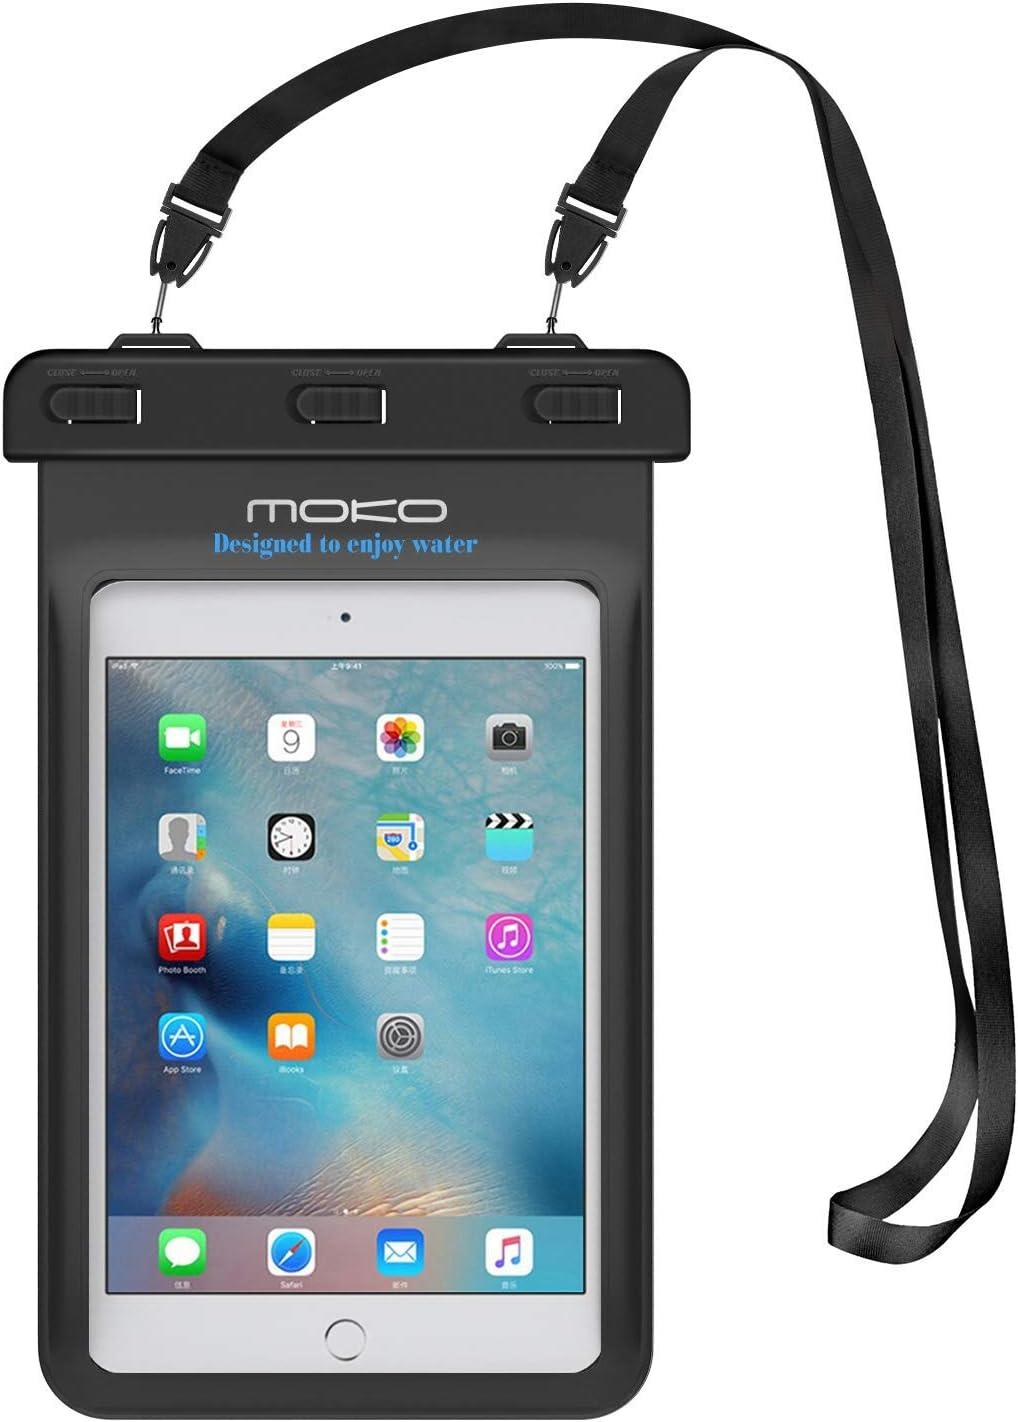 "MoKo Universal Waterproof Case, Dry Bag Pouch for iPad Mini 2019/4/3/2, Samsung Tab 5/4/3, Galaxy Note 8, Tab S2/Tab E/Tab A 8.0, LG G Pad III 8.0, Google Nexus 7(FHD) & More Up to 8.3"" - BLACK"